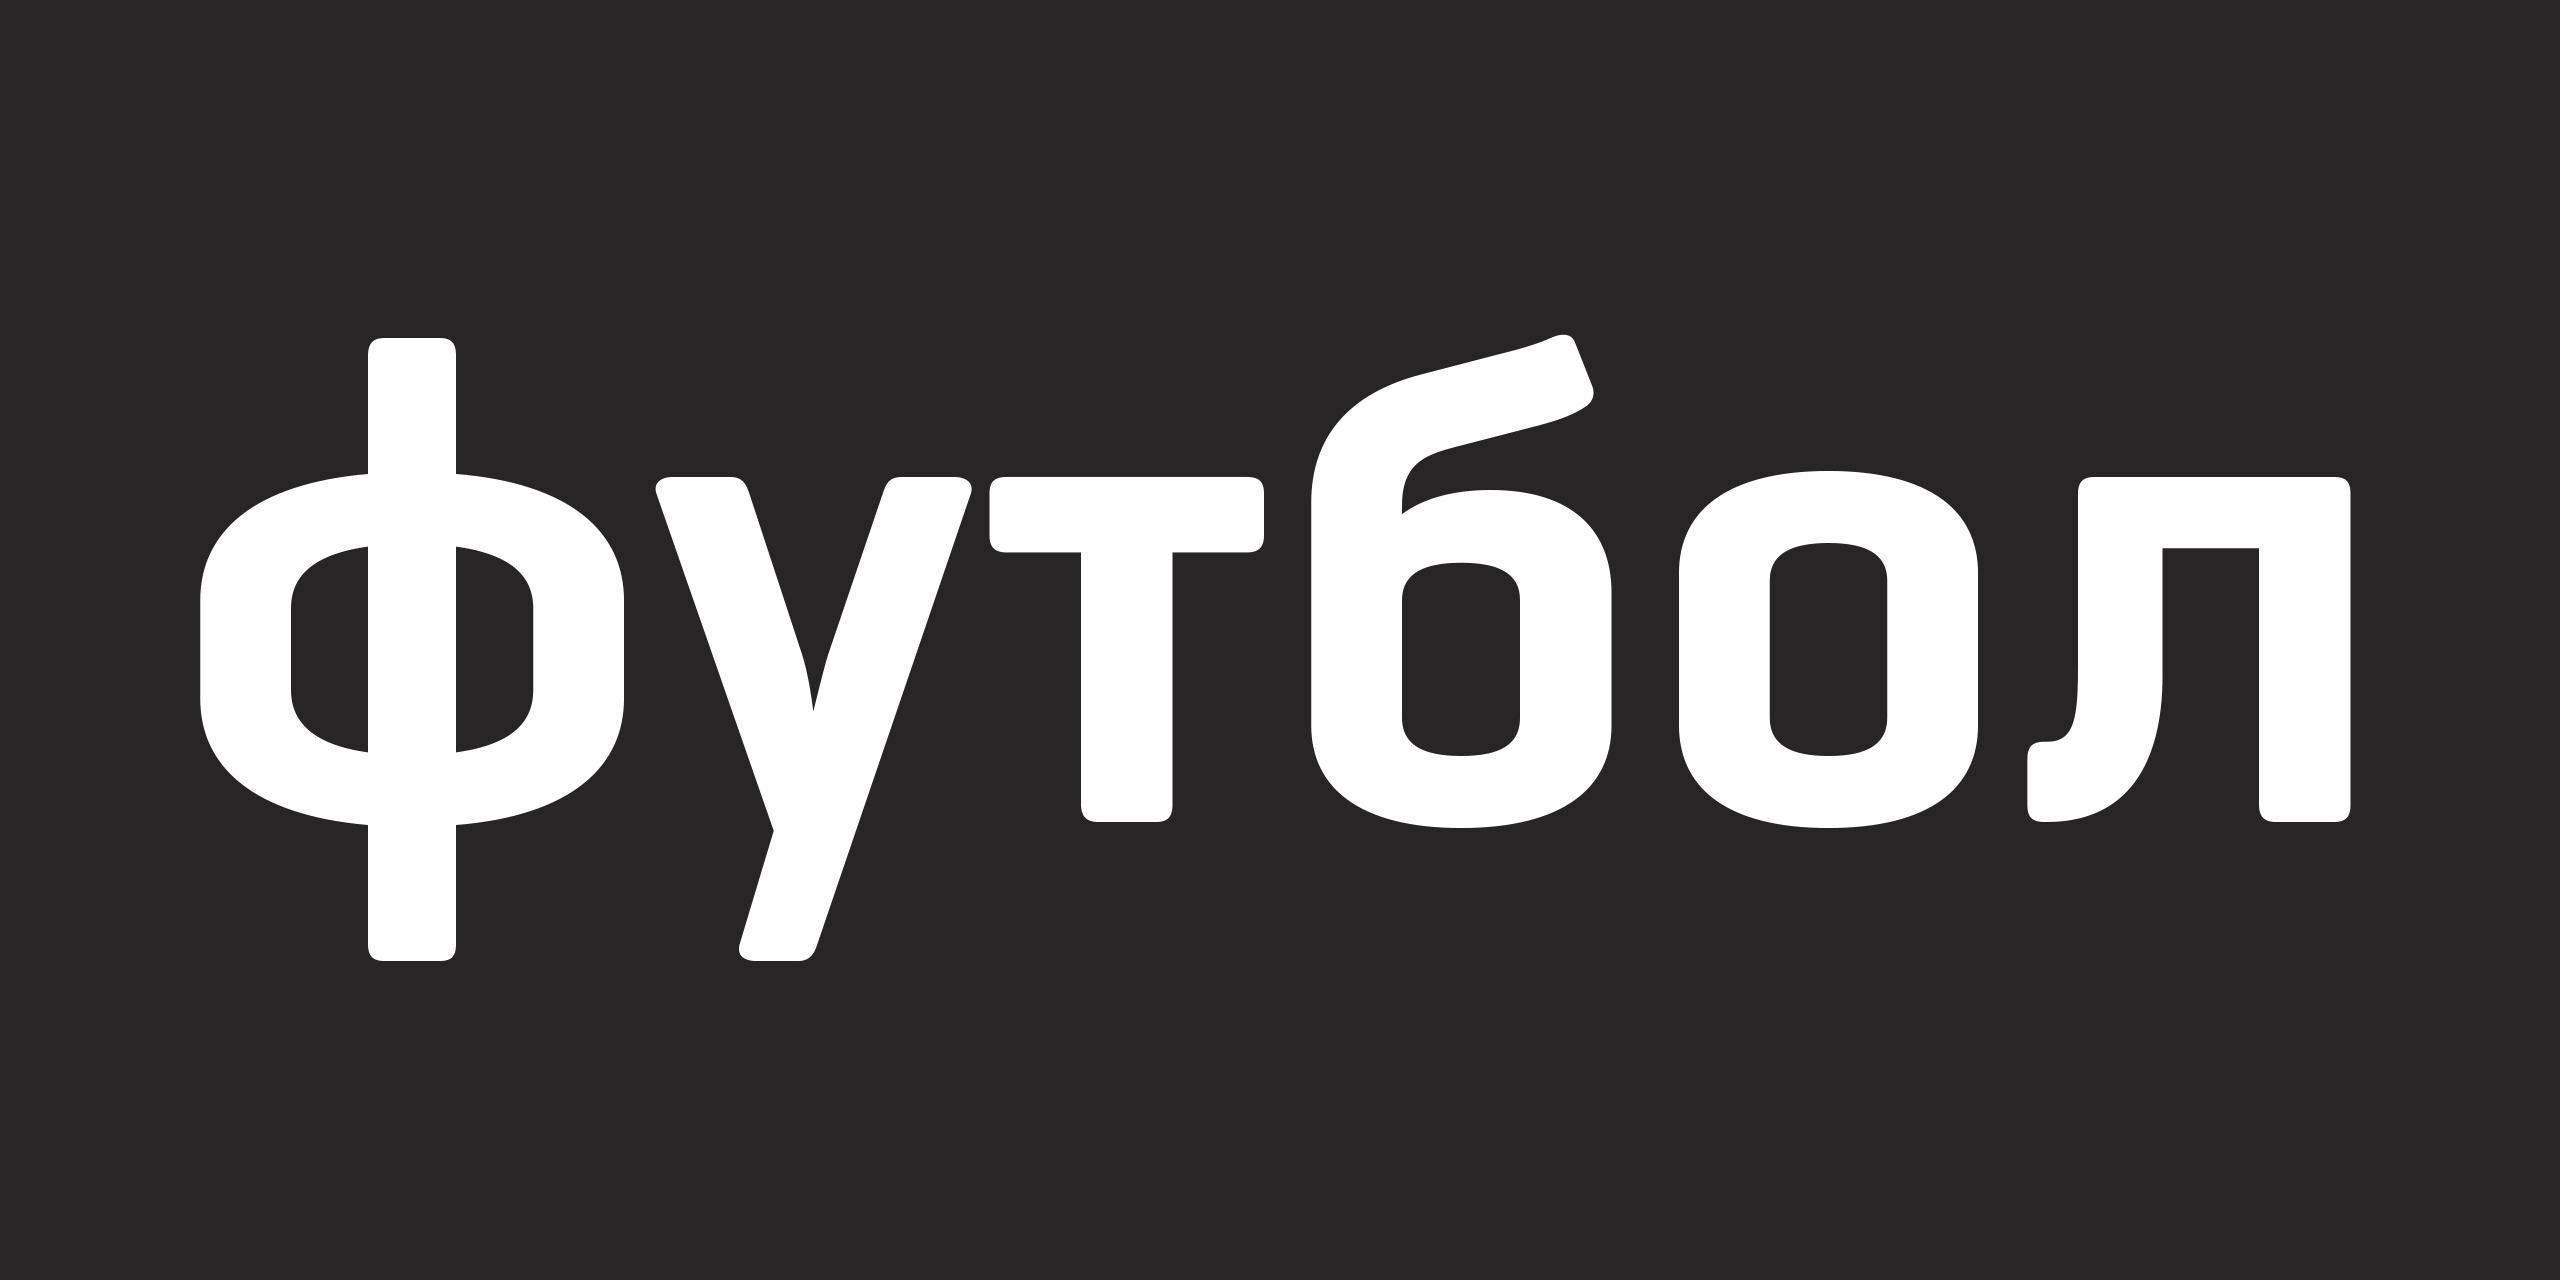 Geogrotesque Cyrillic Font Family